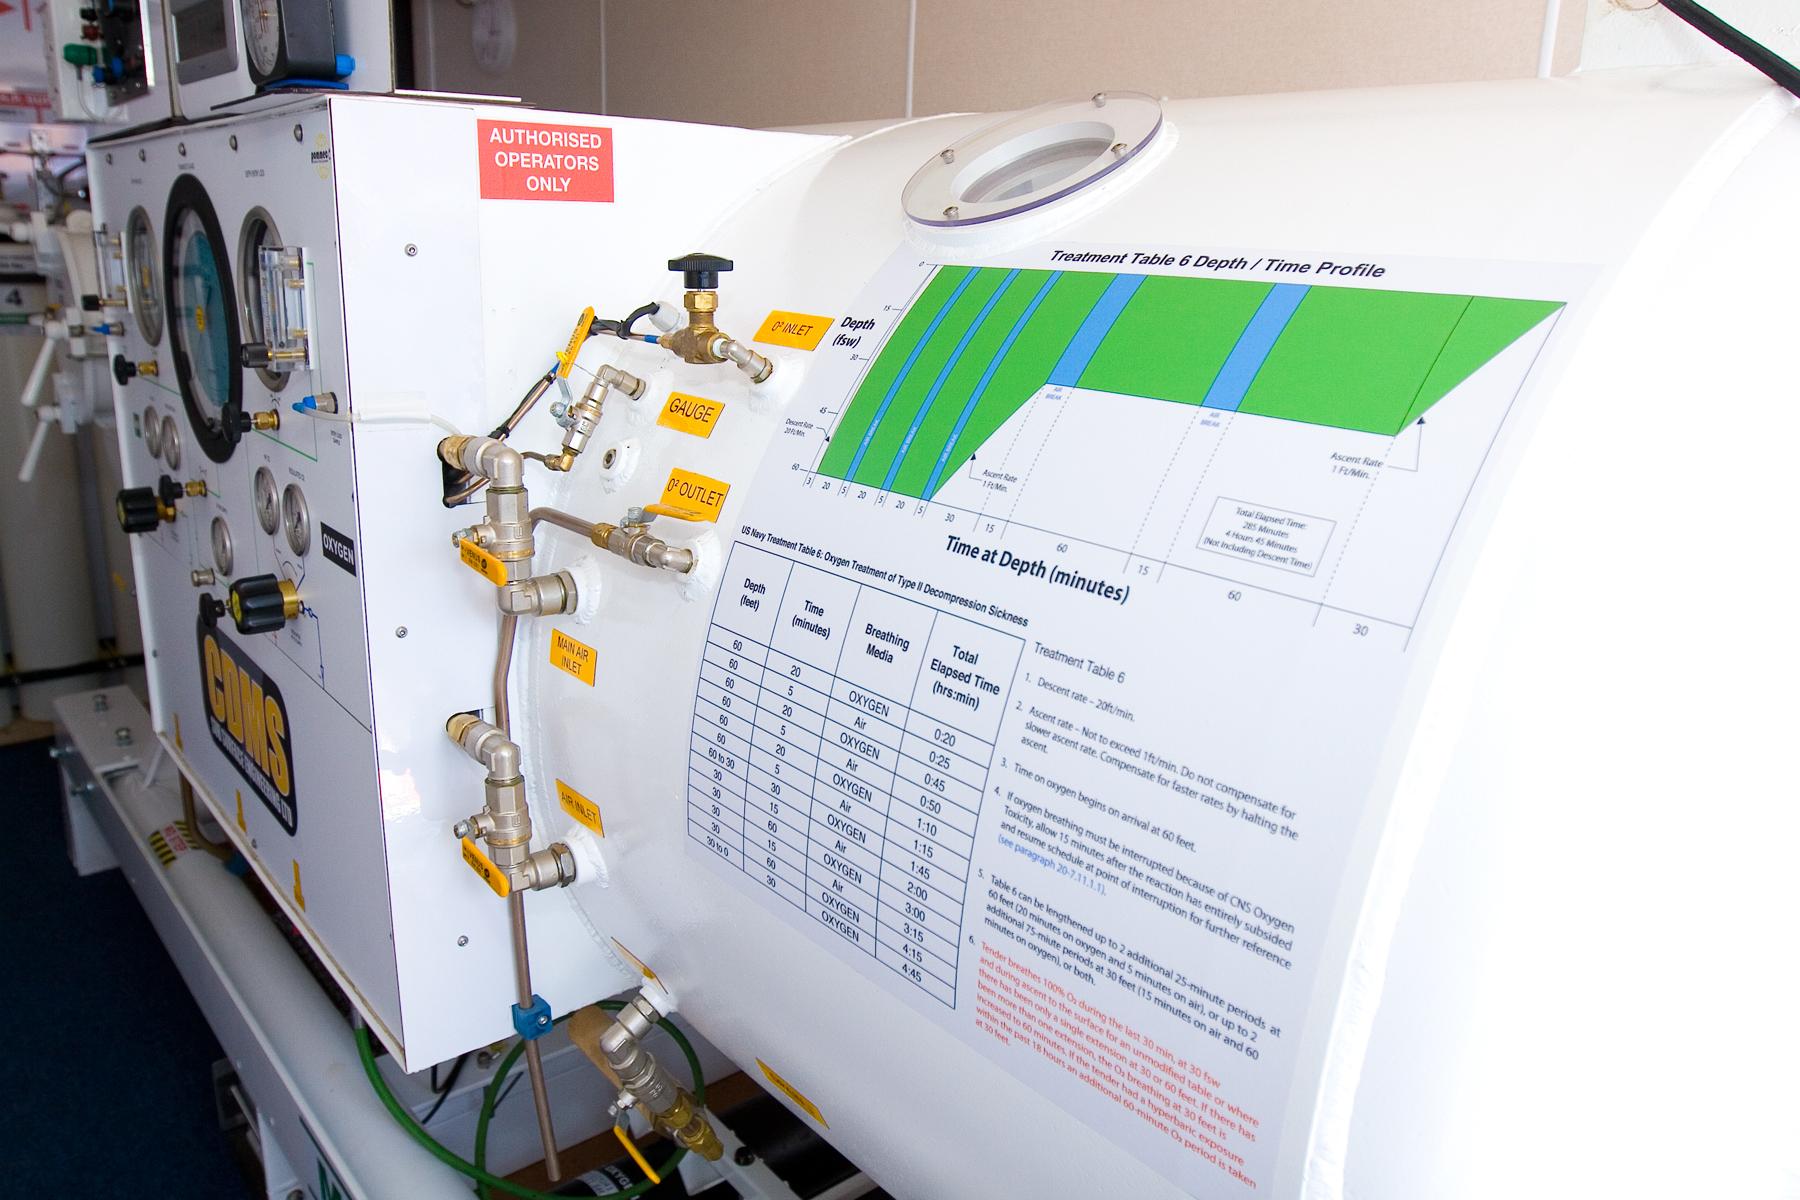 Portable Decompression Chamber - CDMS SSE Ltd